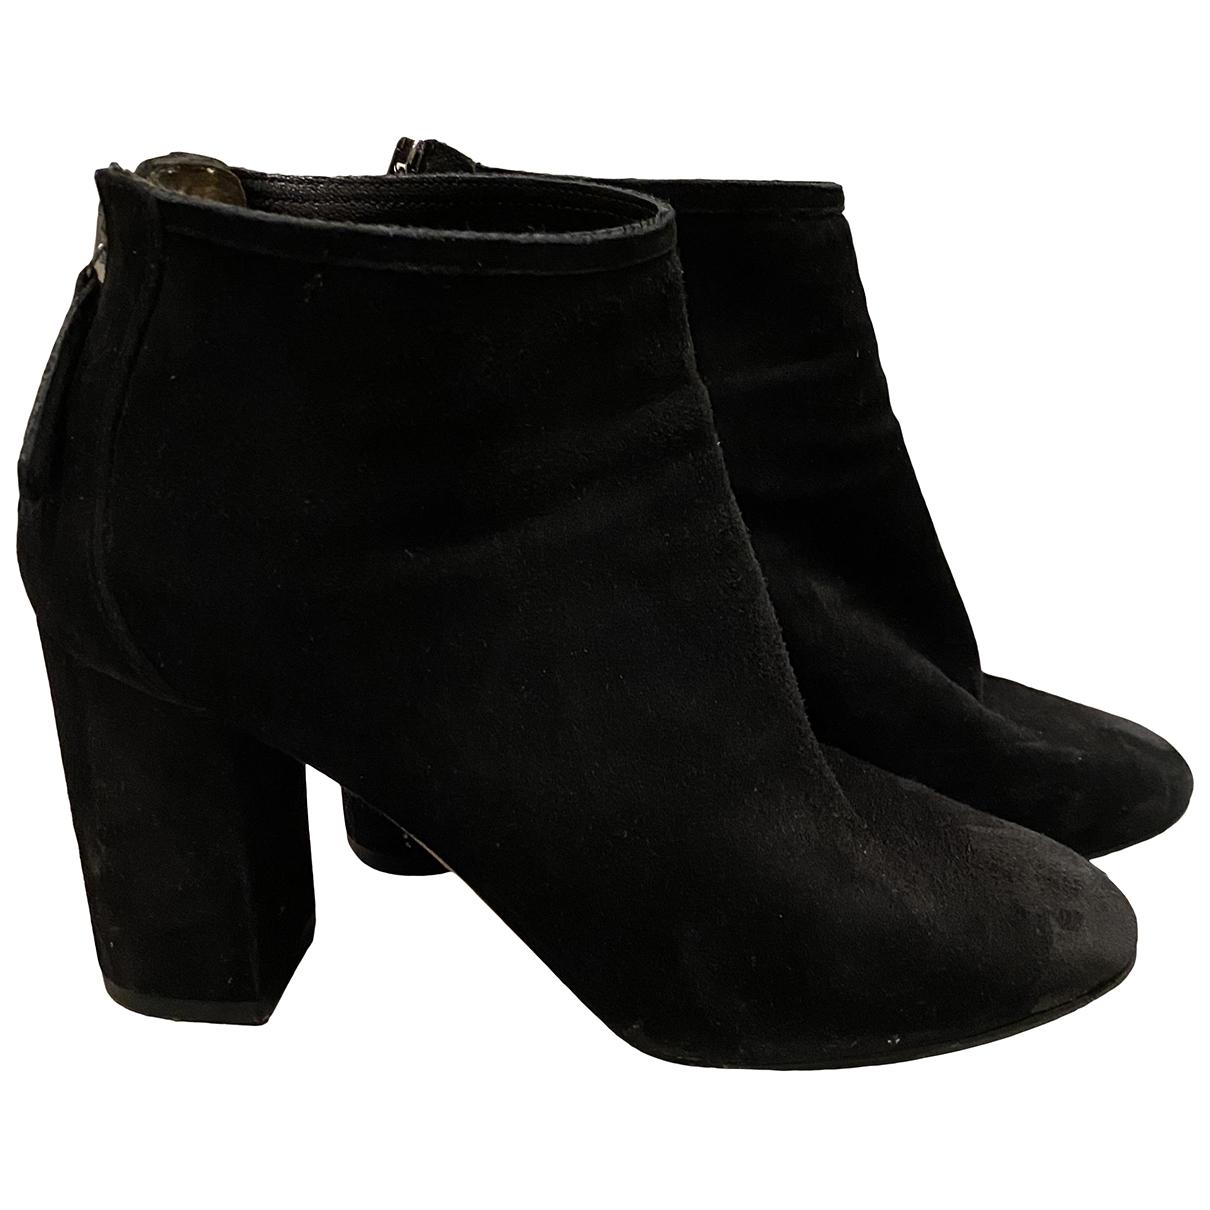 Aquazzura \N Black Suede Ankle boots for Women 36 EU